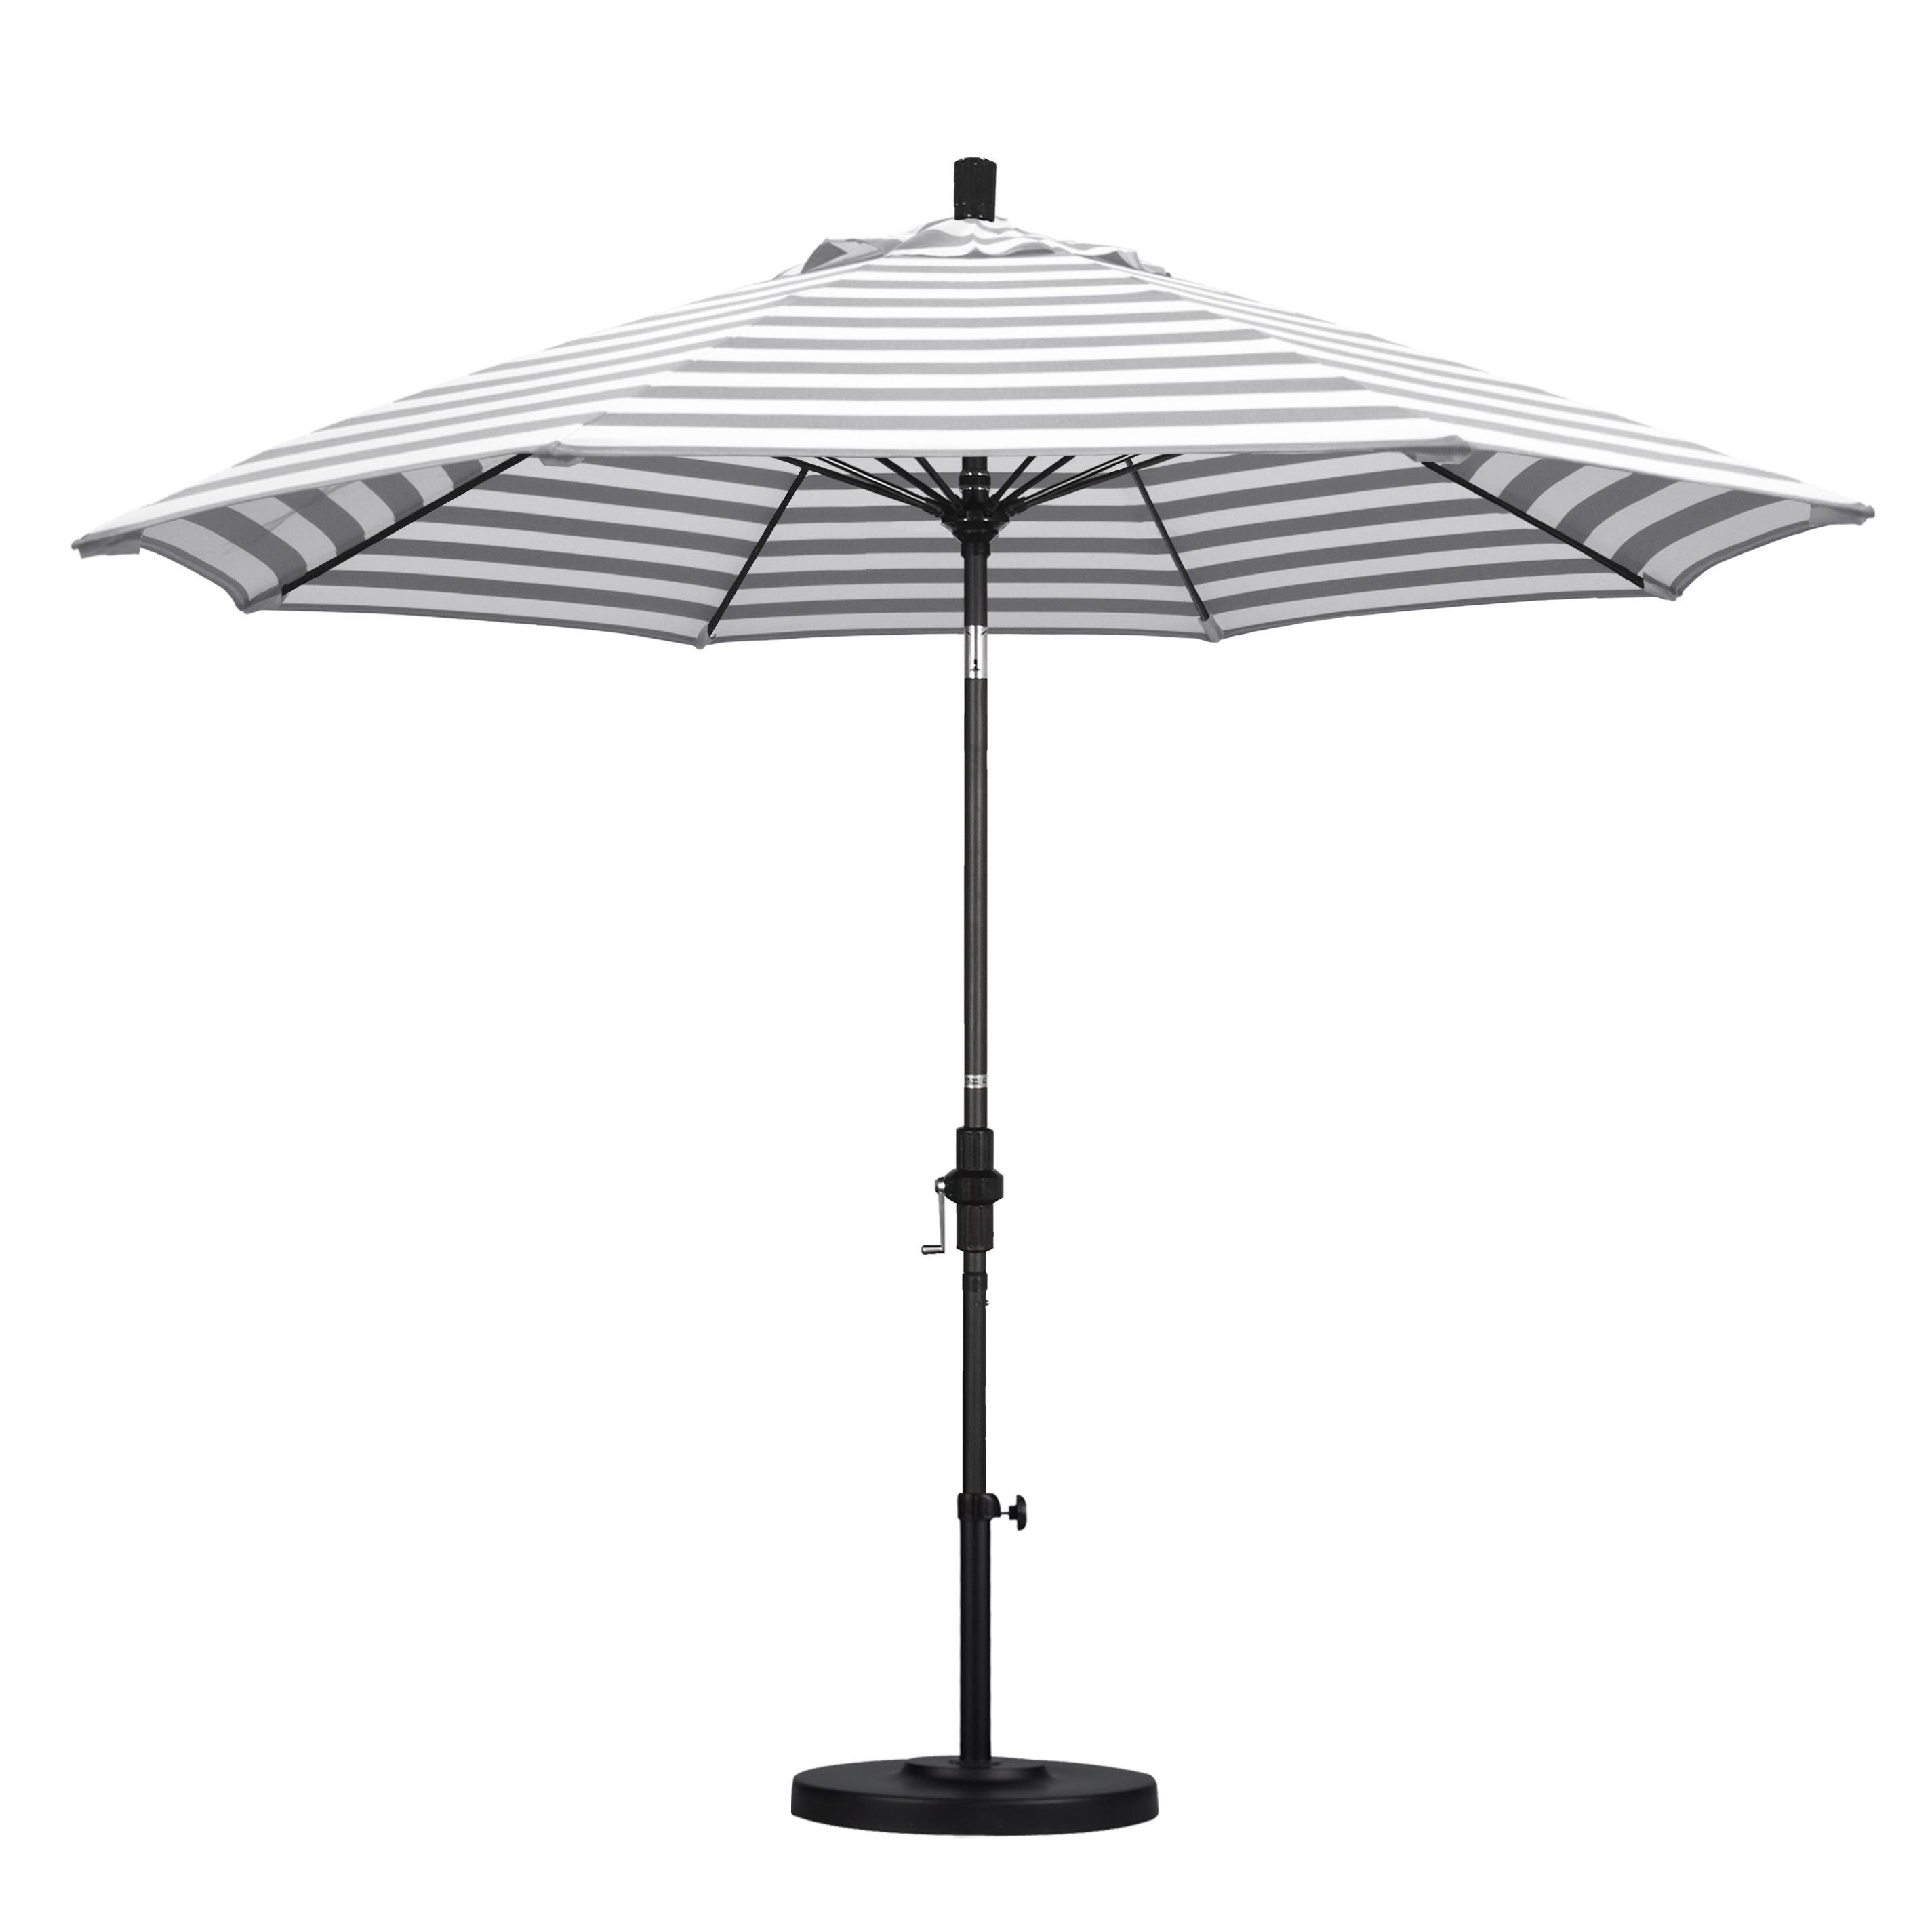 Most Recently Released 9' Market Umbrella Within Aldan Market Umbrellas (View 12 of 20)